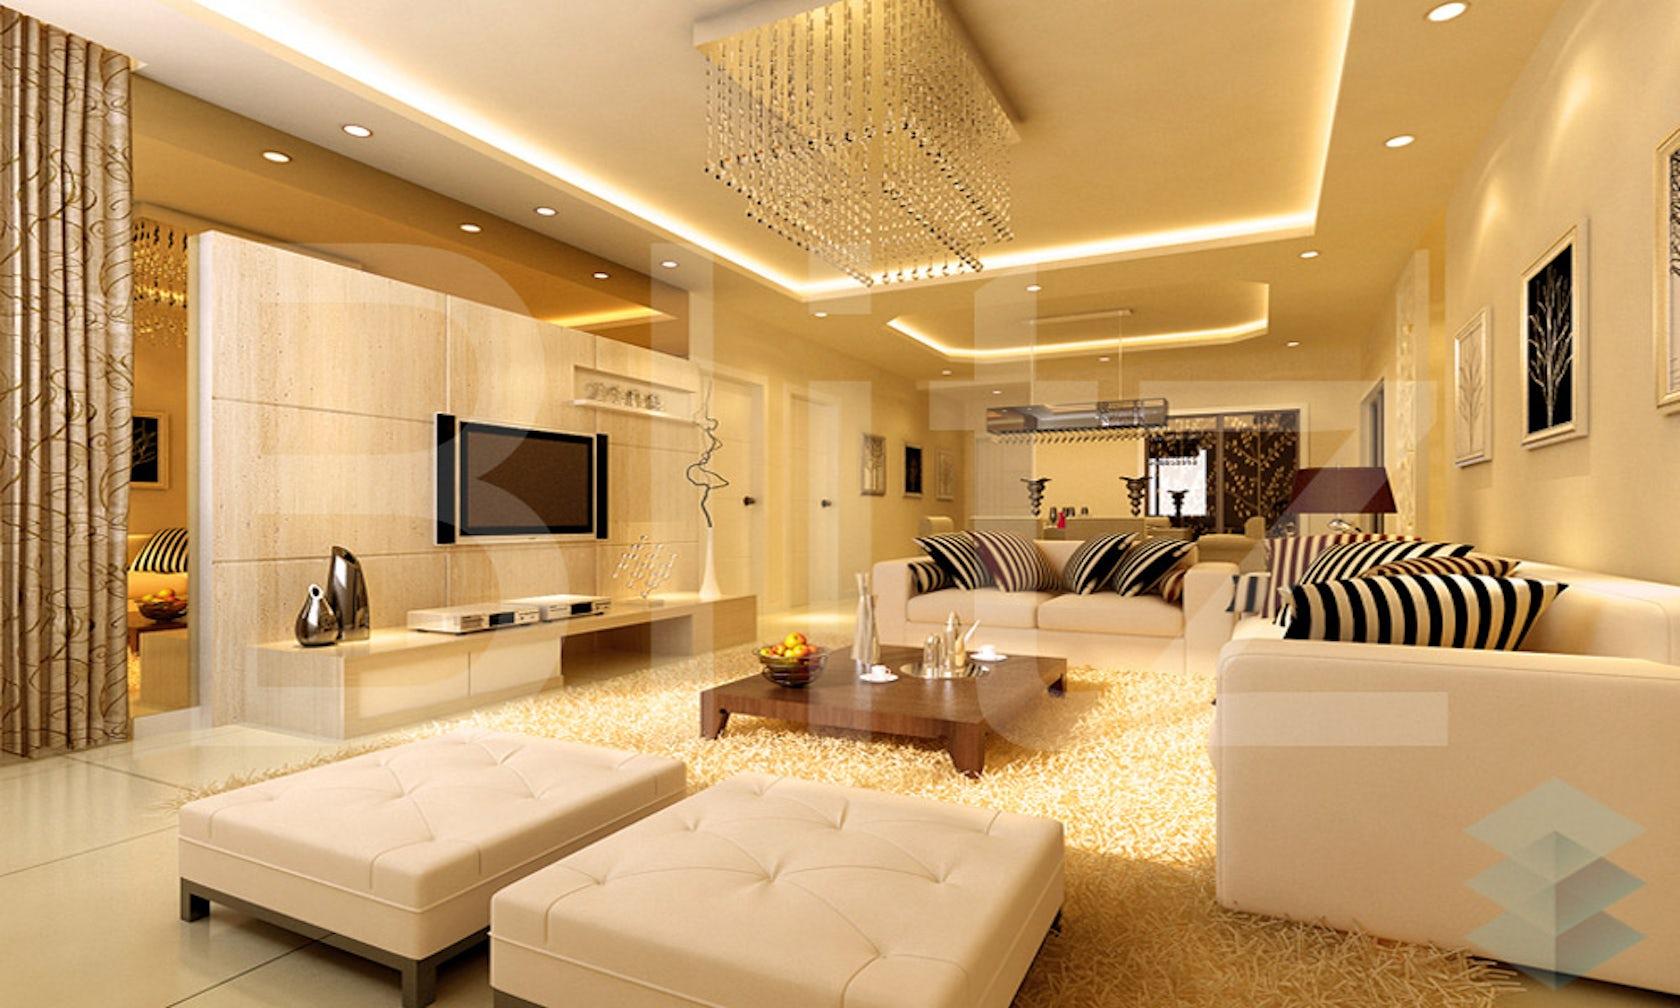 Architect 3d design studio visualization services for Architectural design services